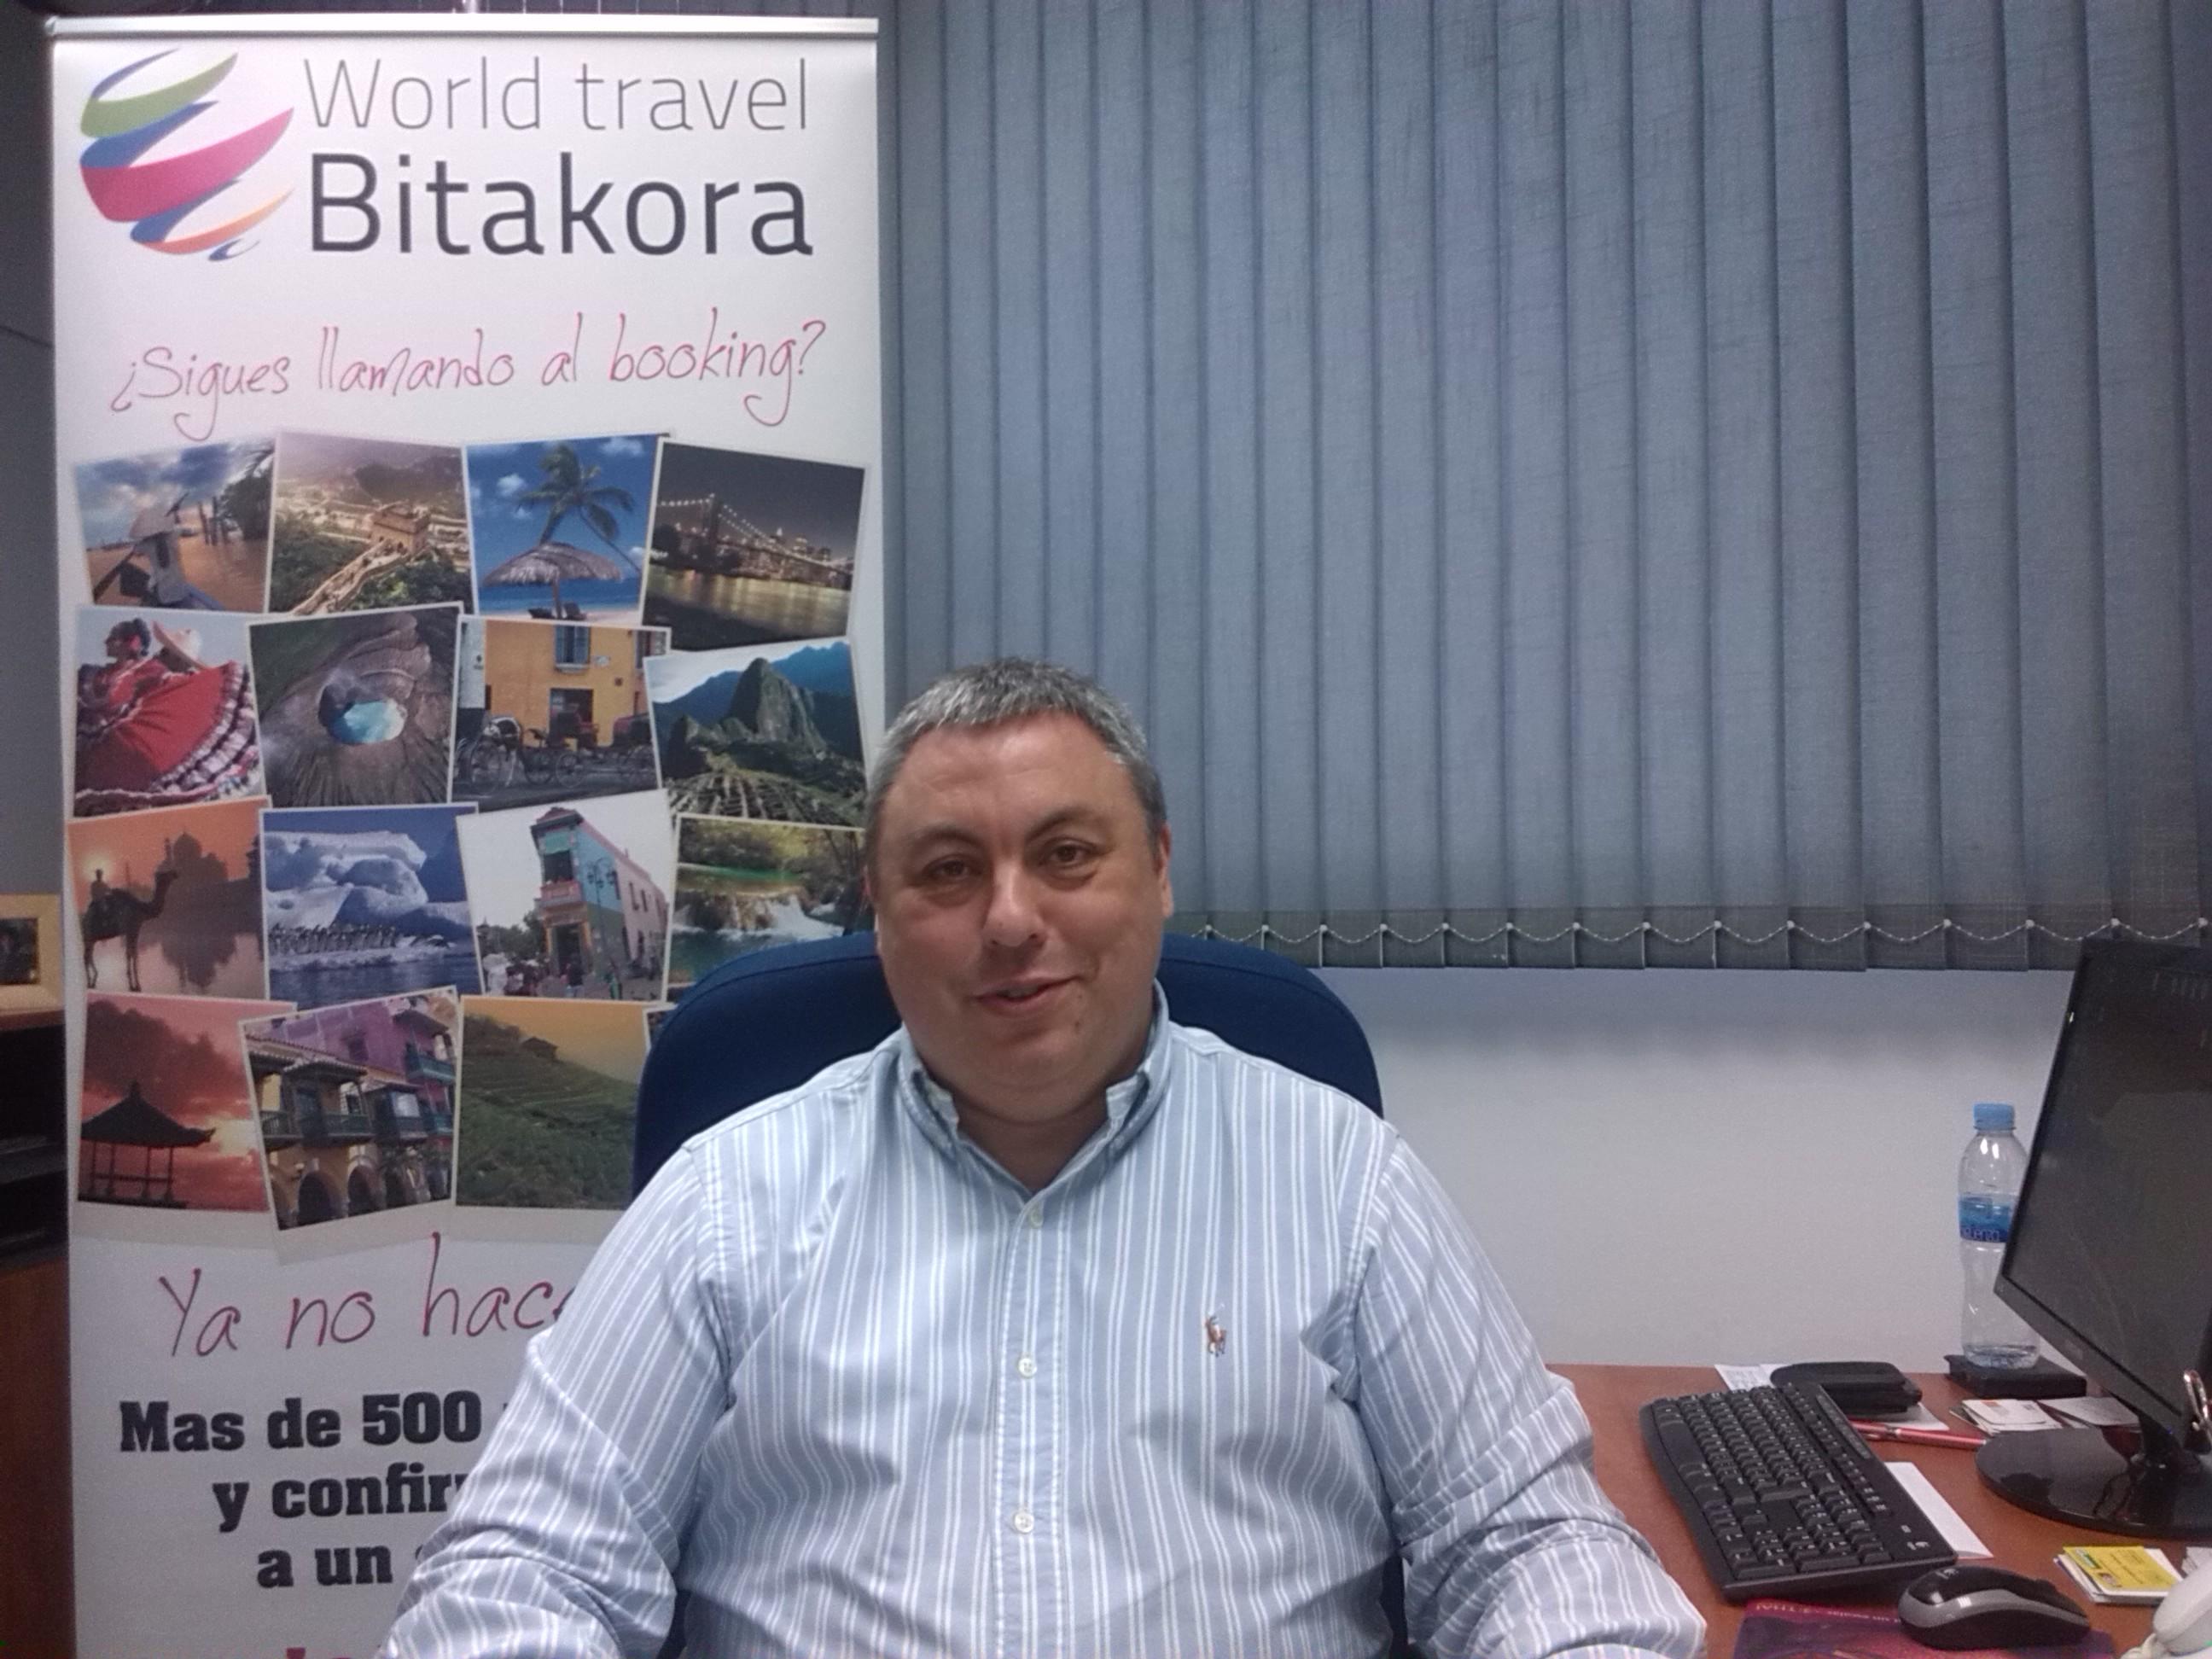 Patricio Barbancho de World Travel Bitakora